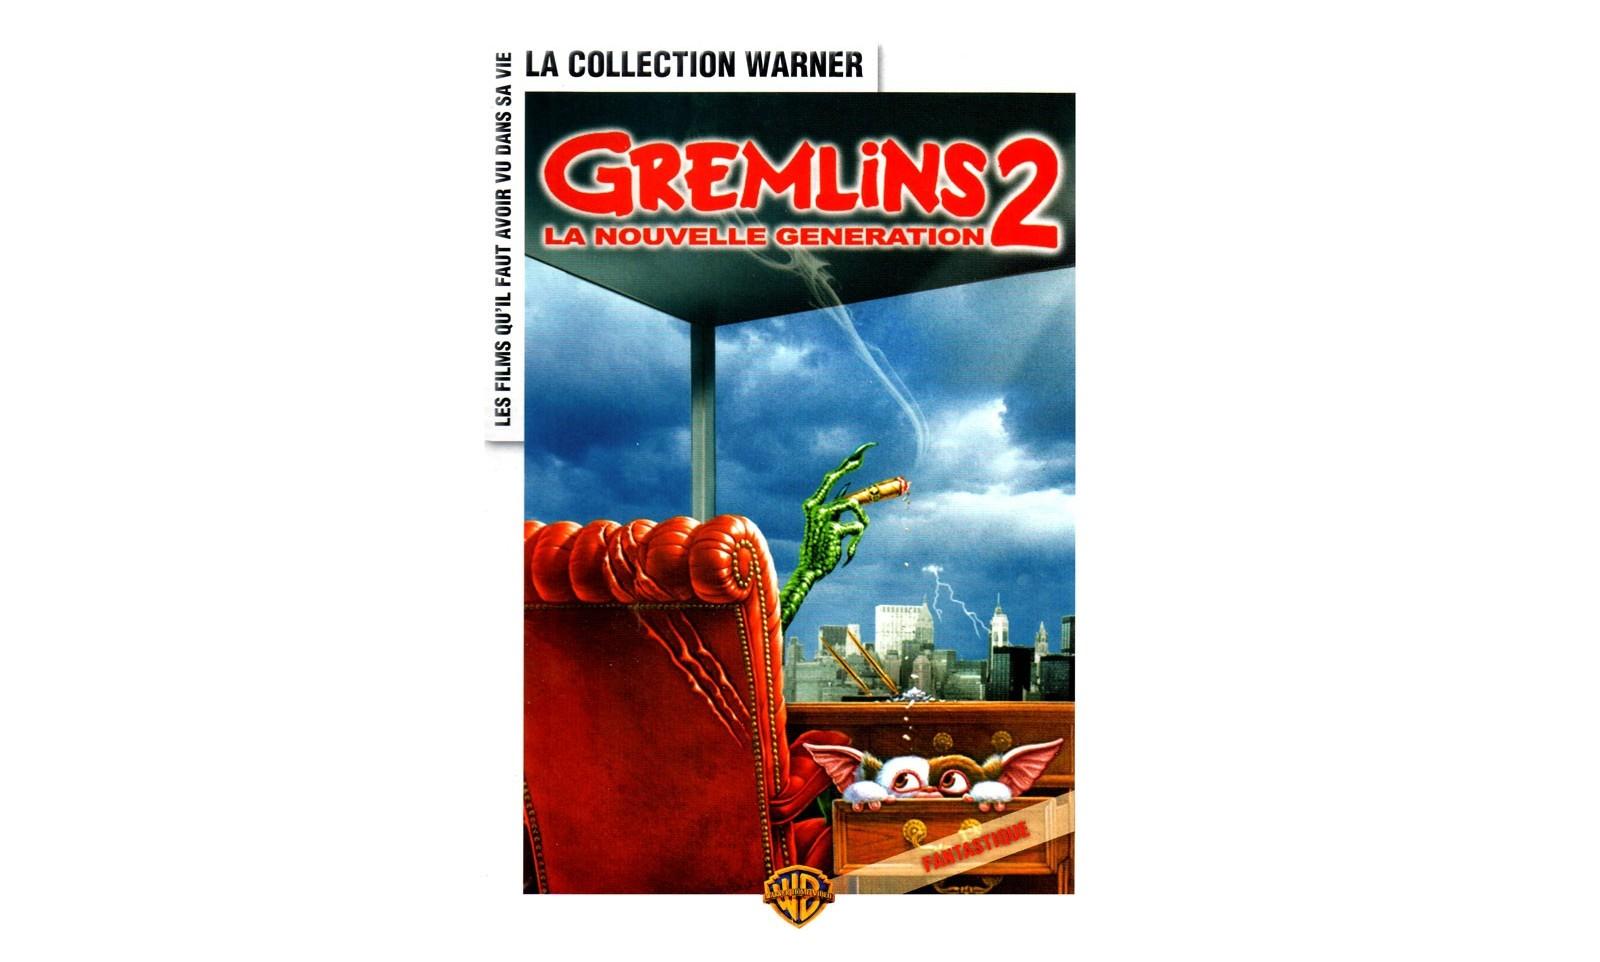 gremlins 2 coffret cadeau 2 mugs et dvd goodies film horreur collector cin ma. Black Bedroom Furniture Sets. Home Design Ideas